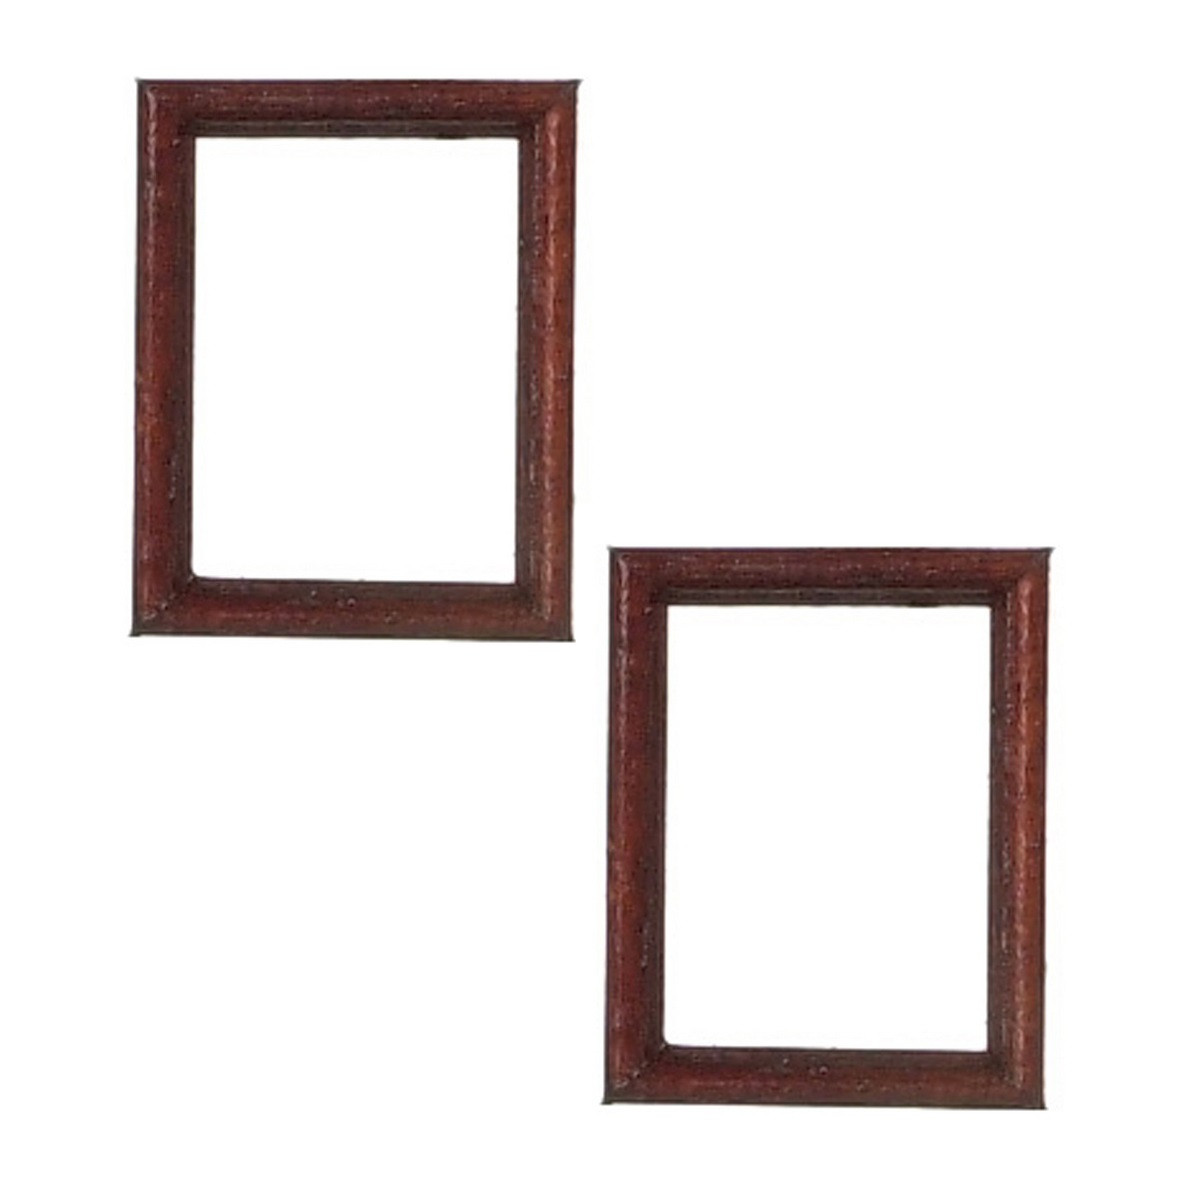 FCA2994MH - Mahogany Frames - Jeepers Dollhouse Miniatures